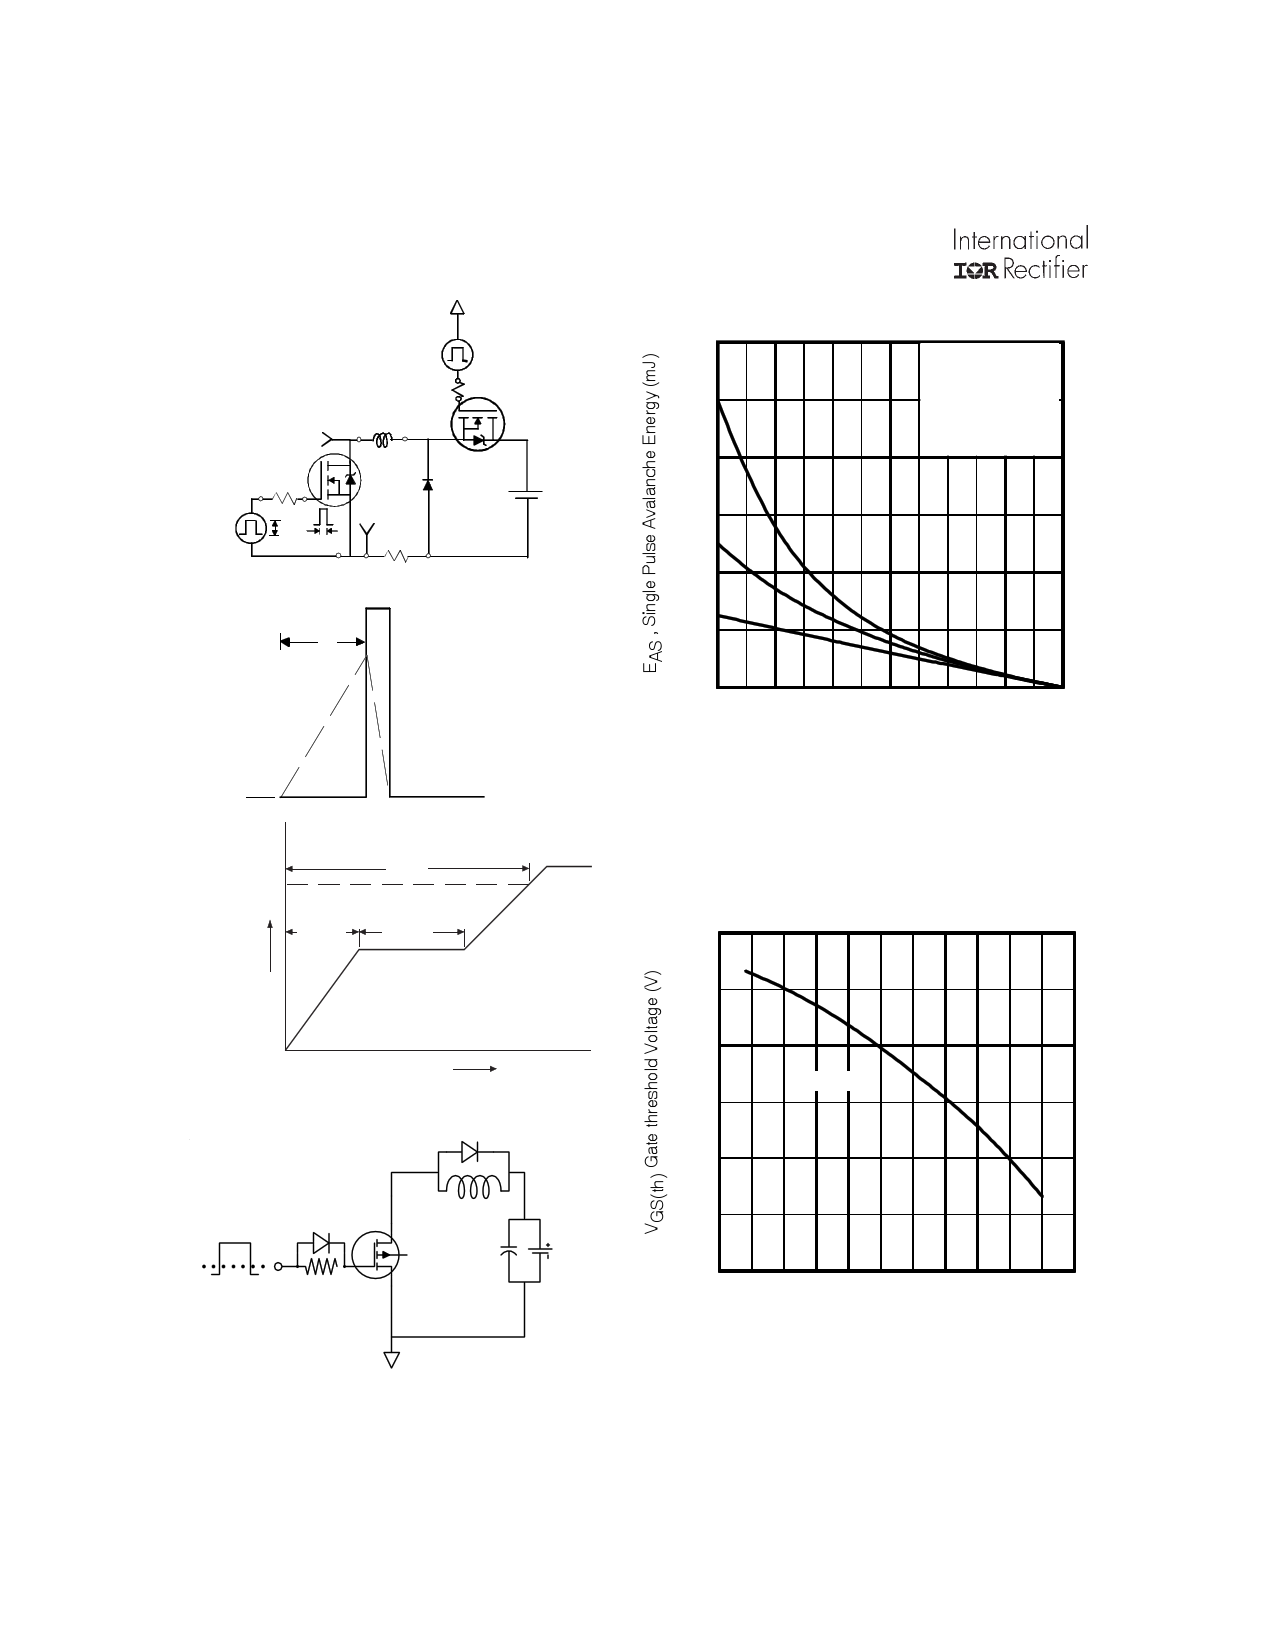 IRFZ46ZPbF 電子部品, 半導体